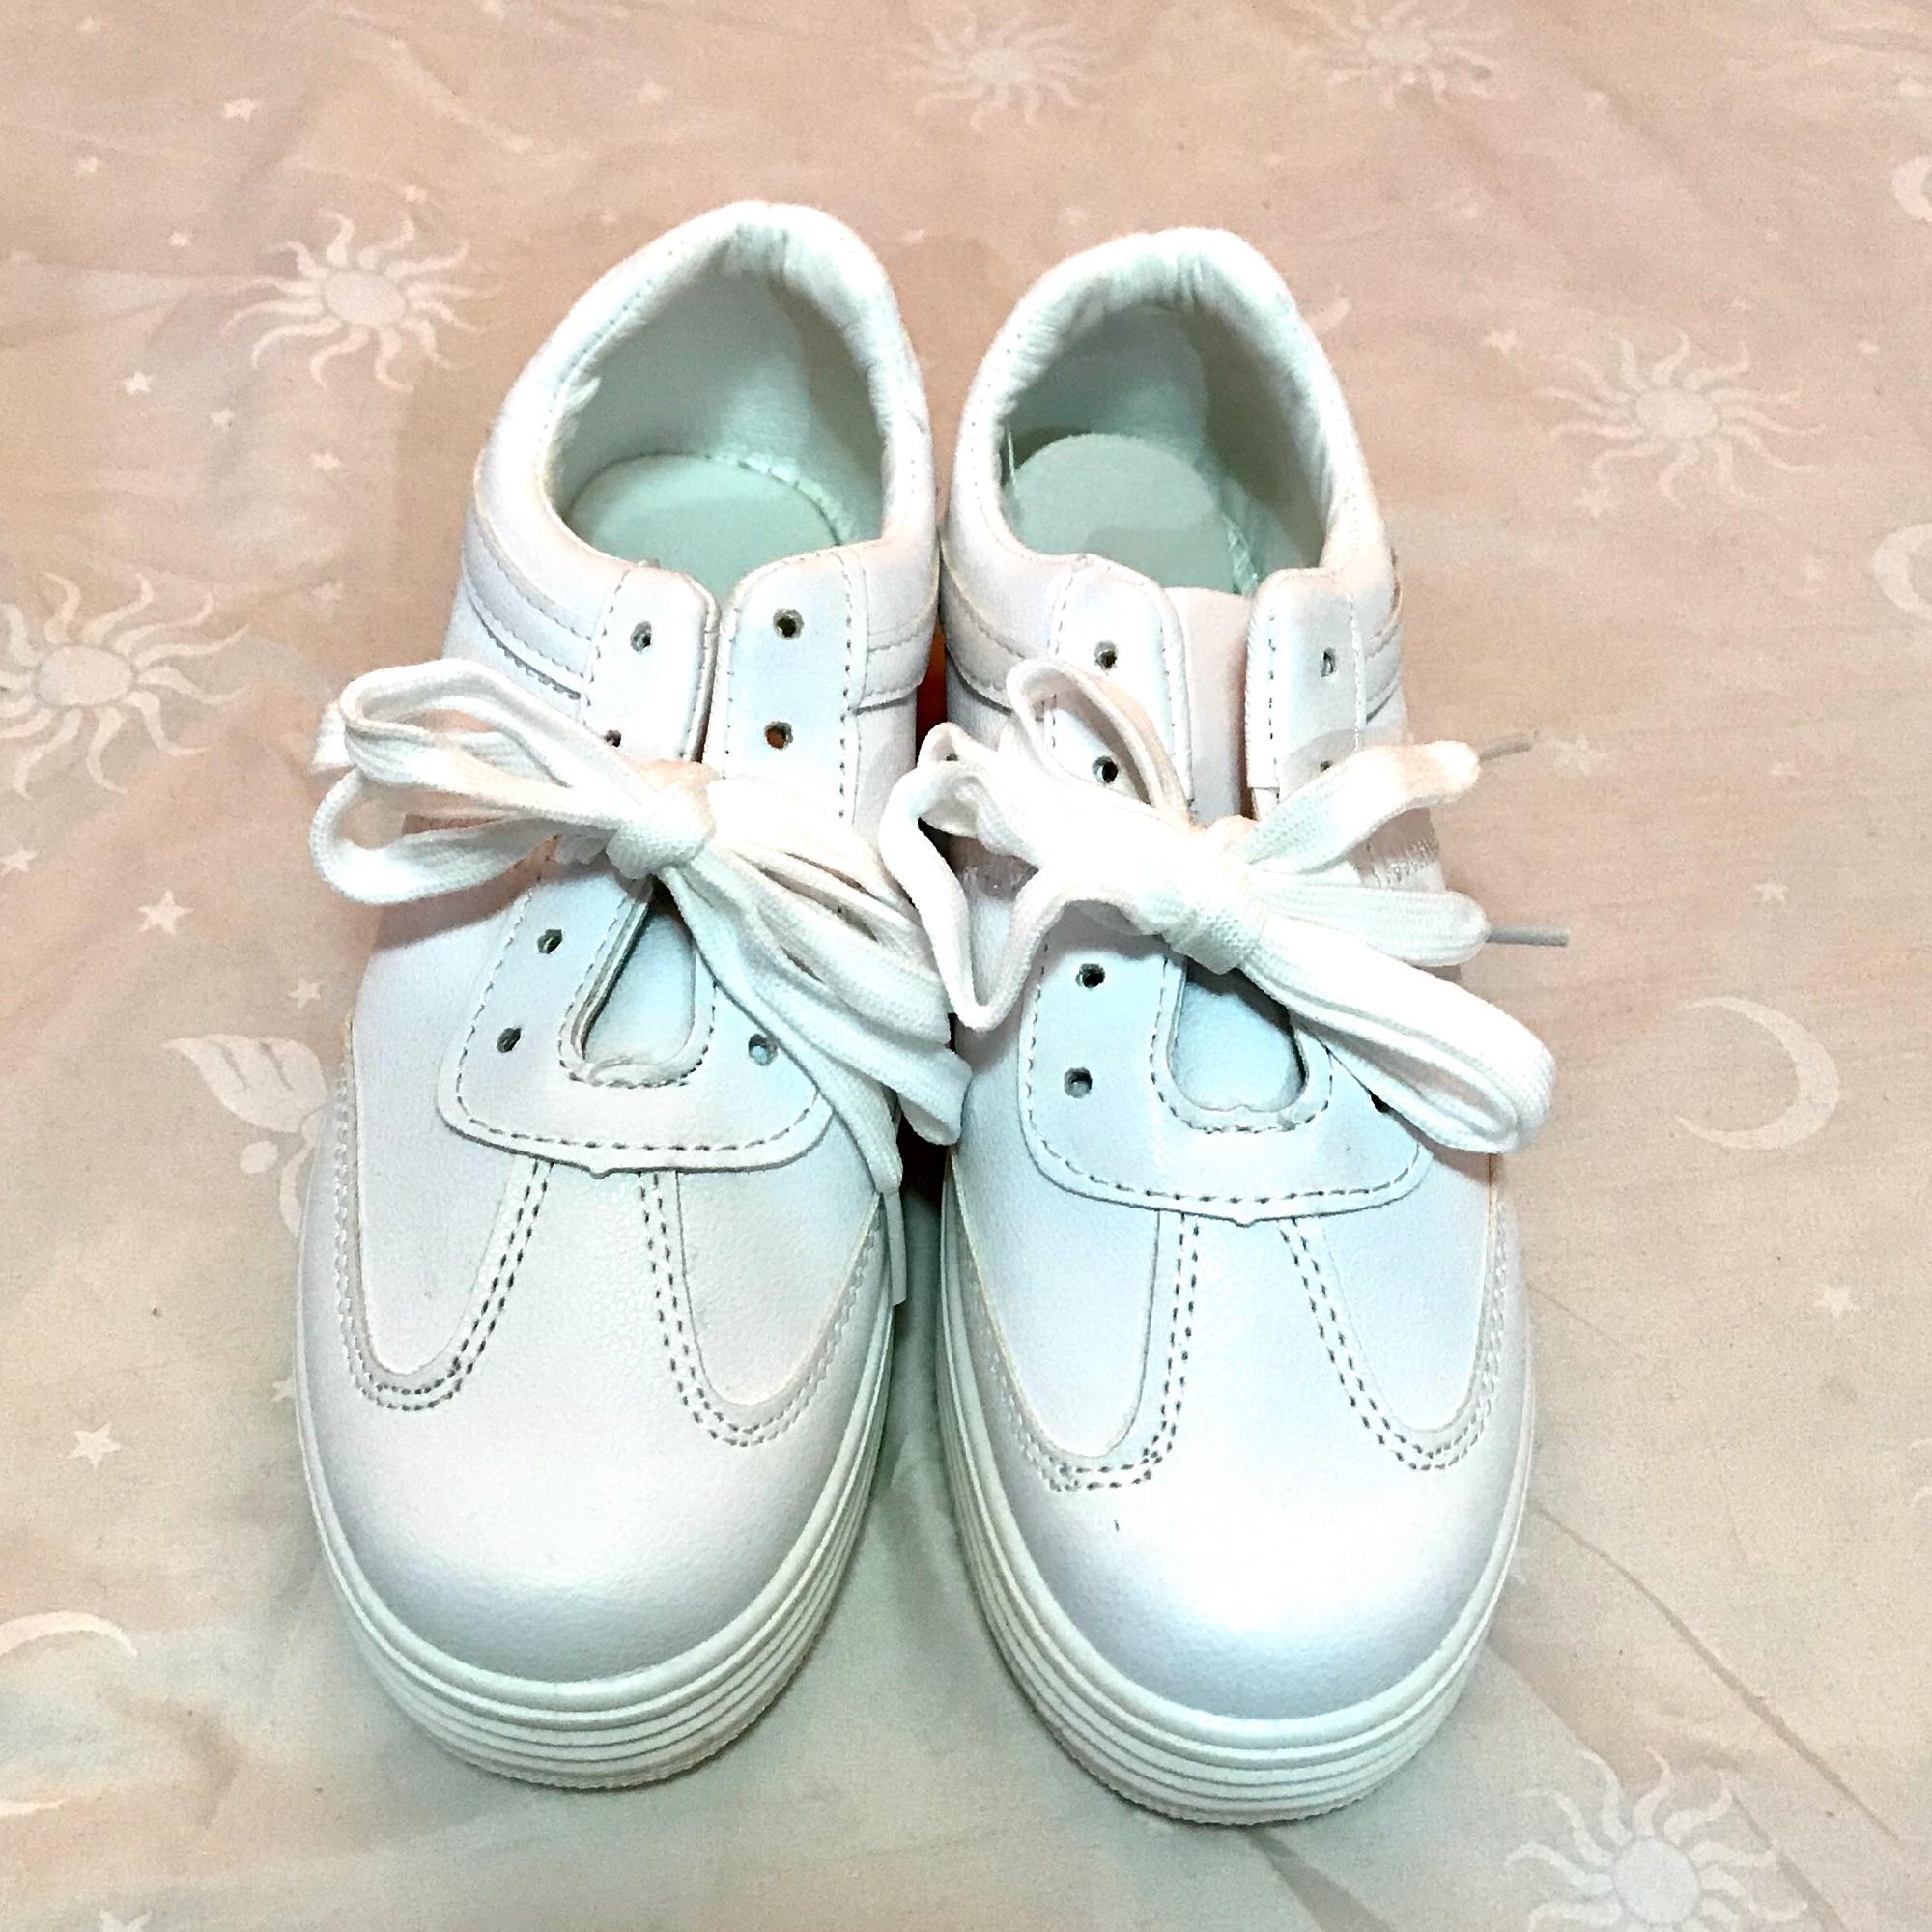 Korean White Rubber Shoes: Buy sell